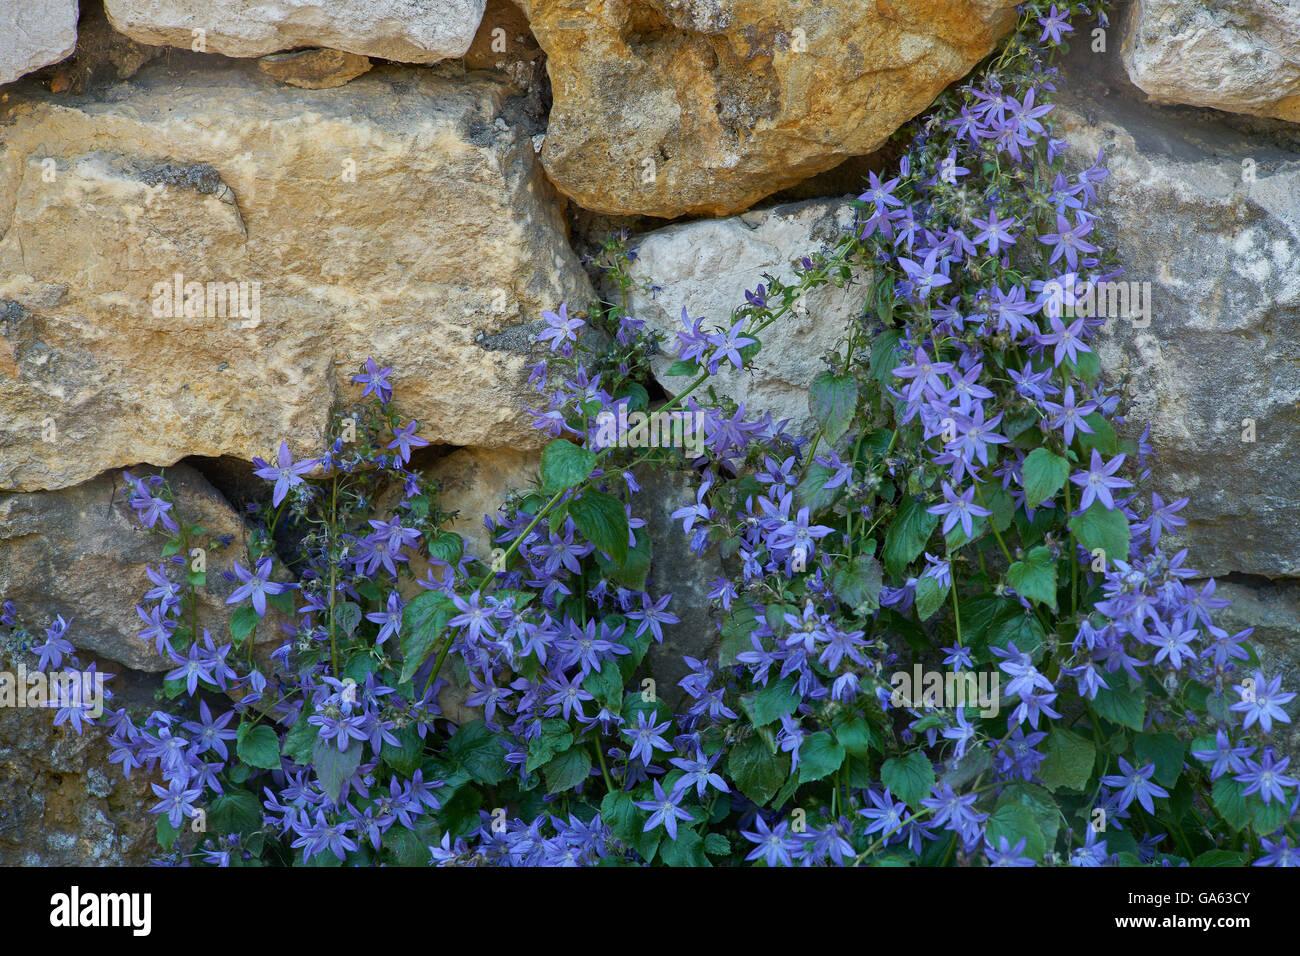 Campanula poscharskyana serbian trailing bellflowers bellflower  blossom - Stock Image